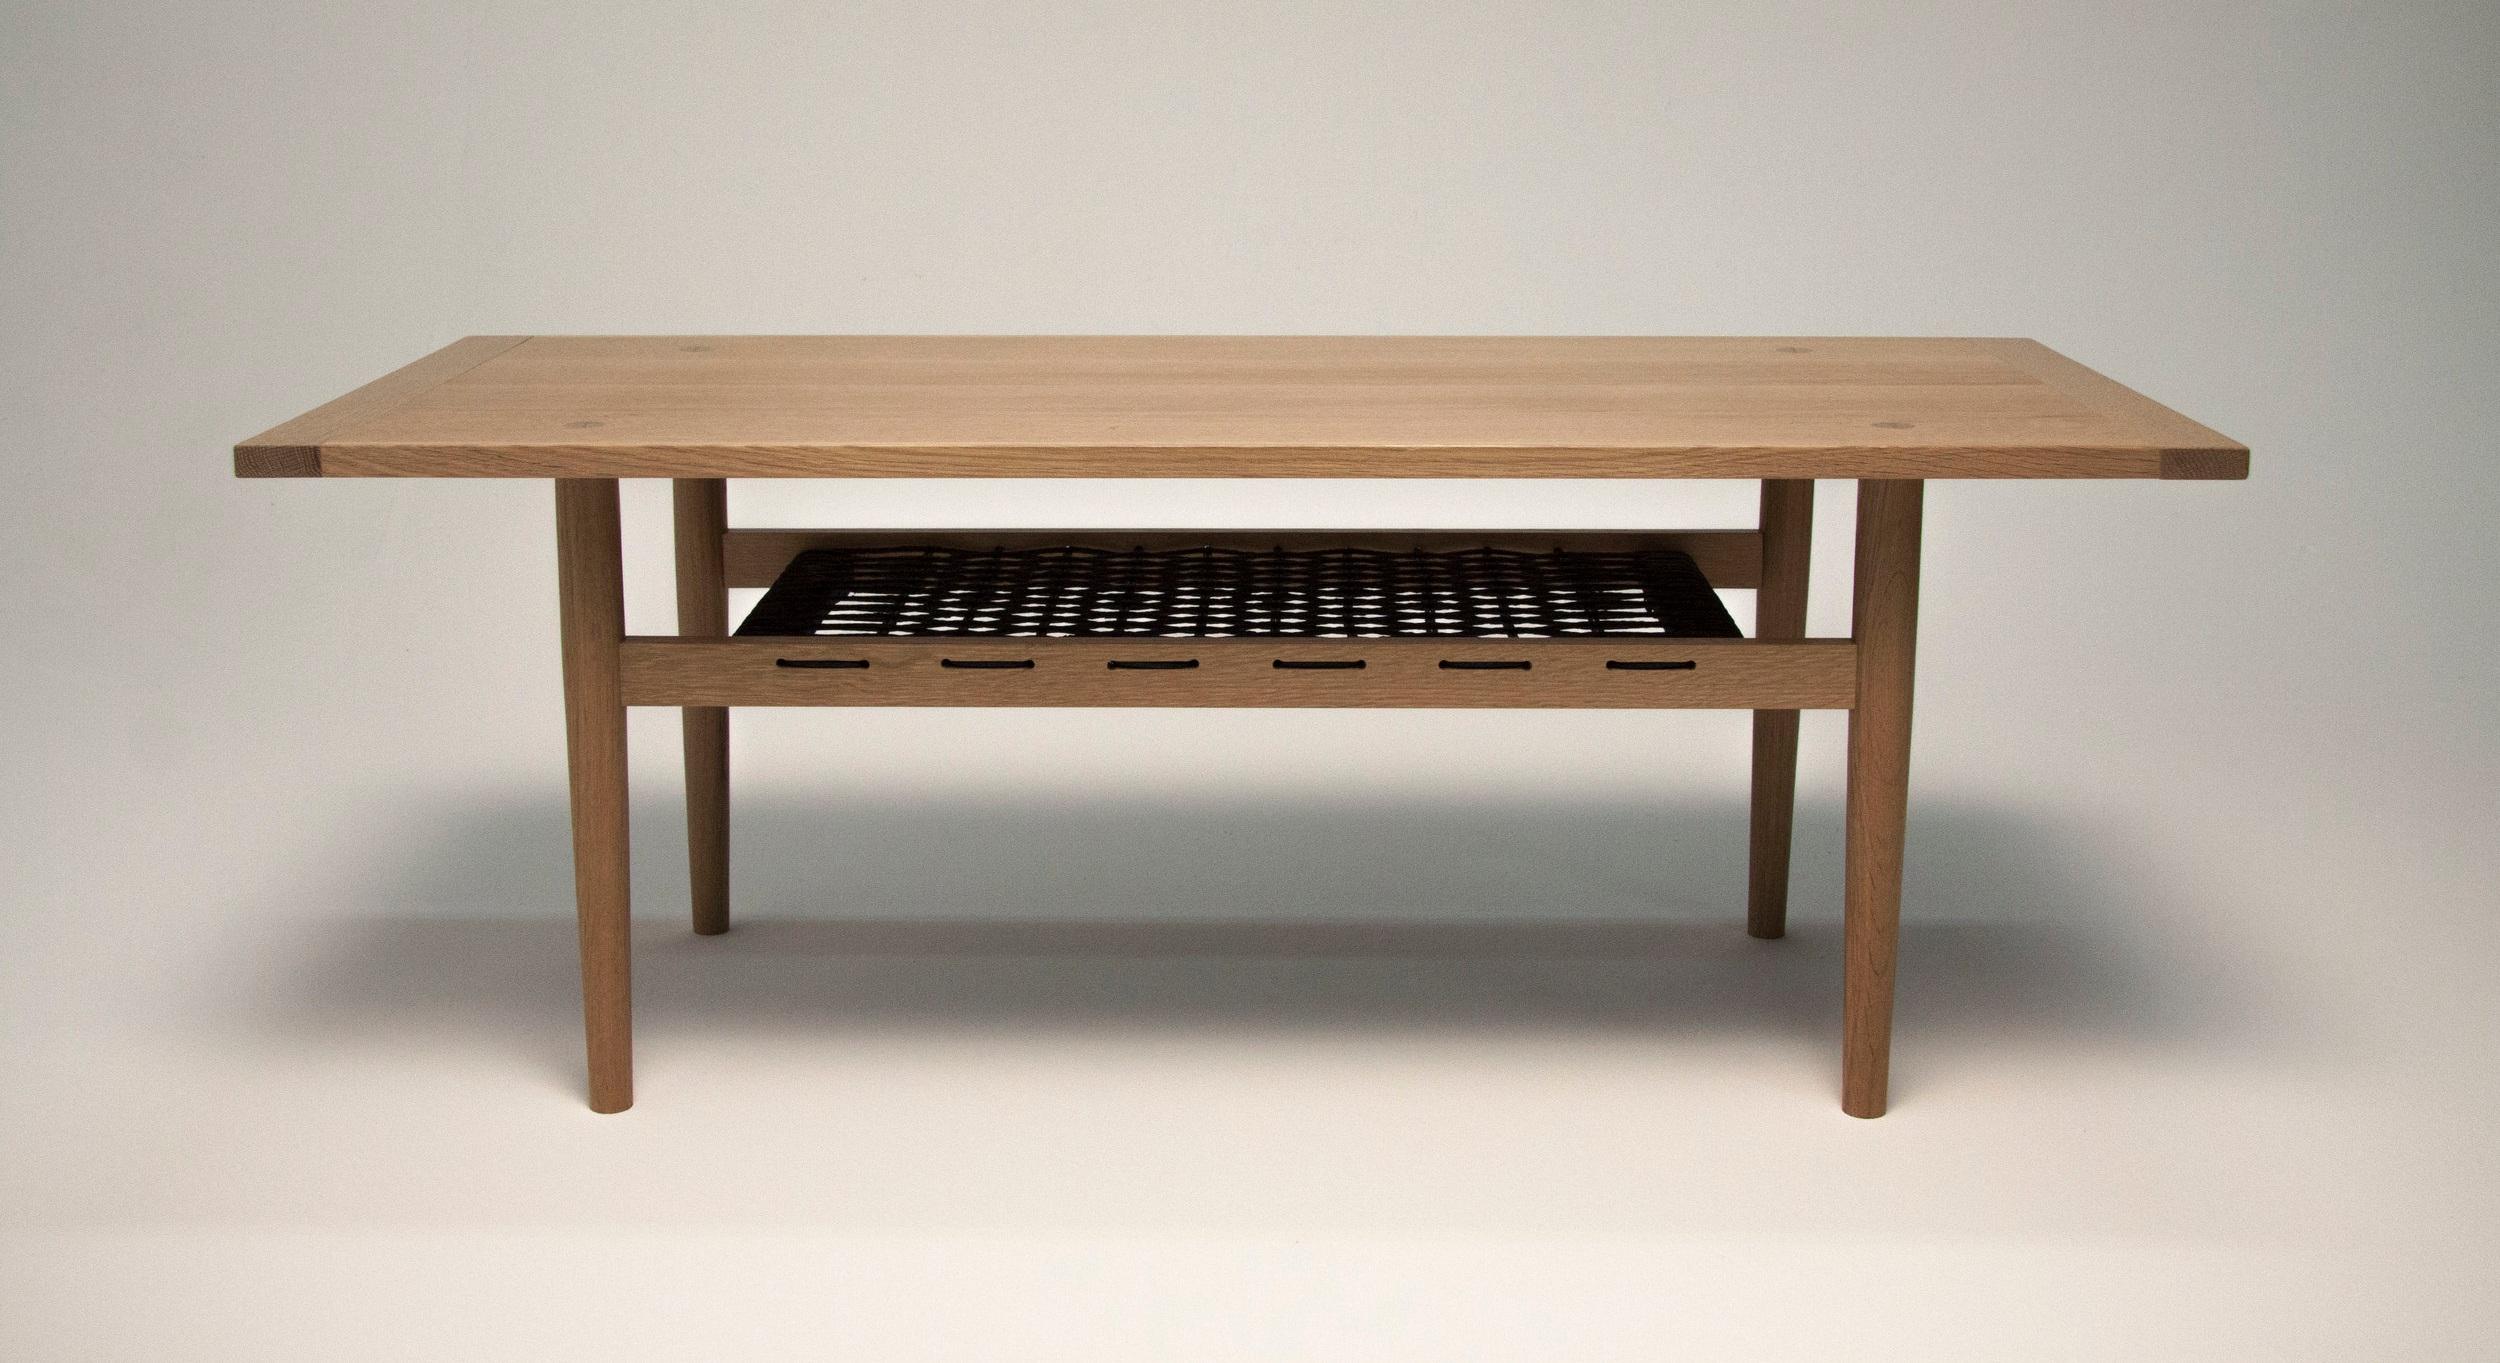 "grete coffee table. white oak, danish cord, 46"" x 20"" x 17"", 2016"